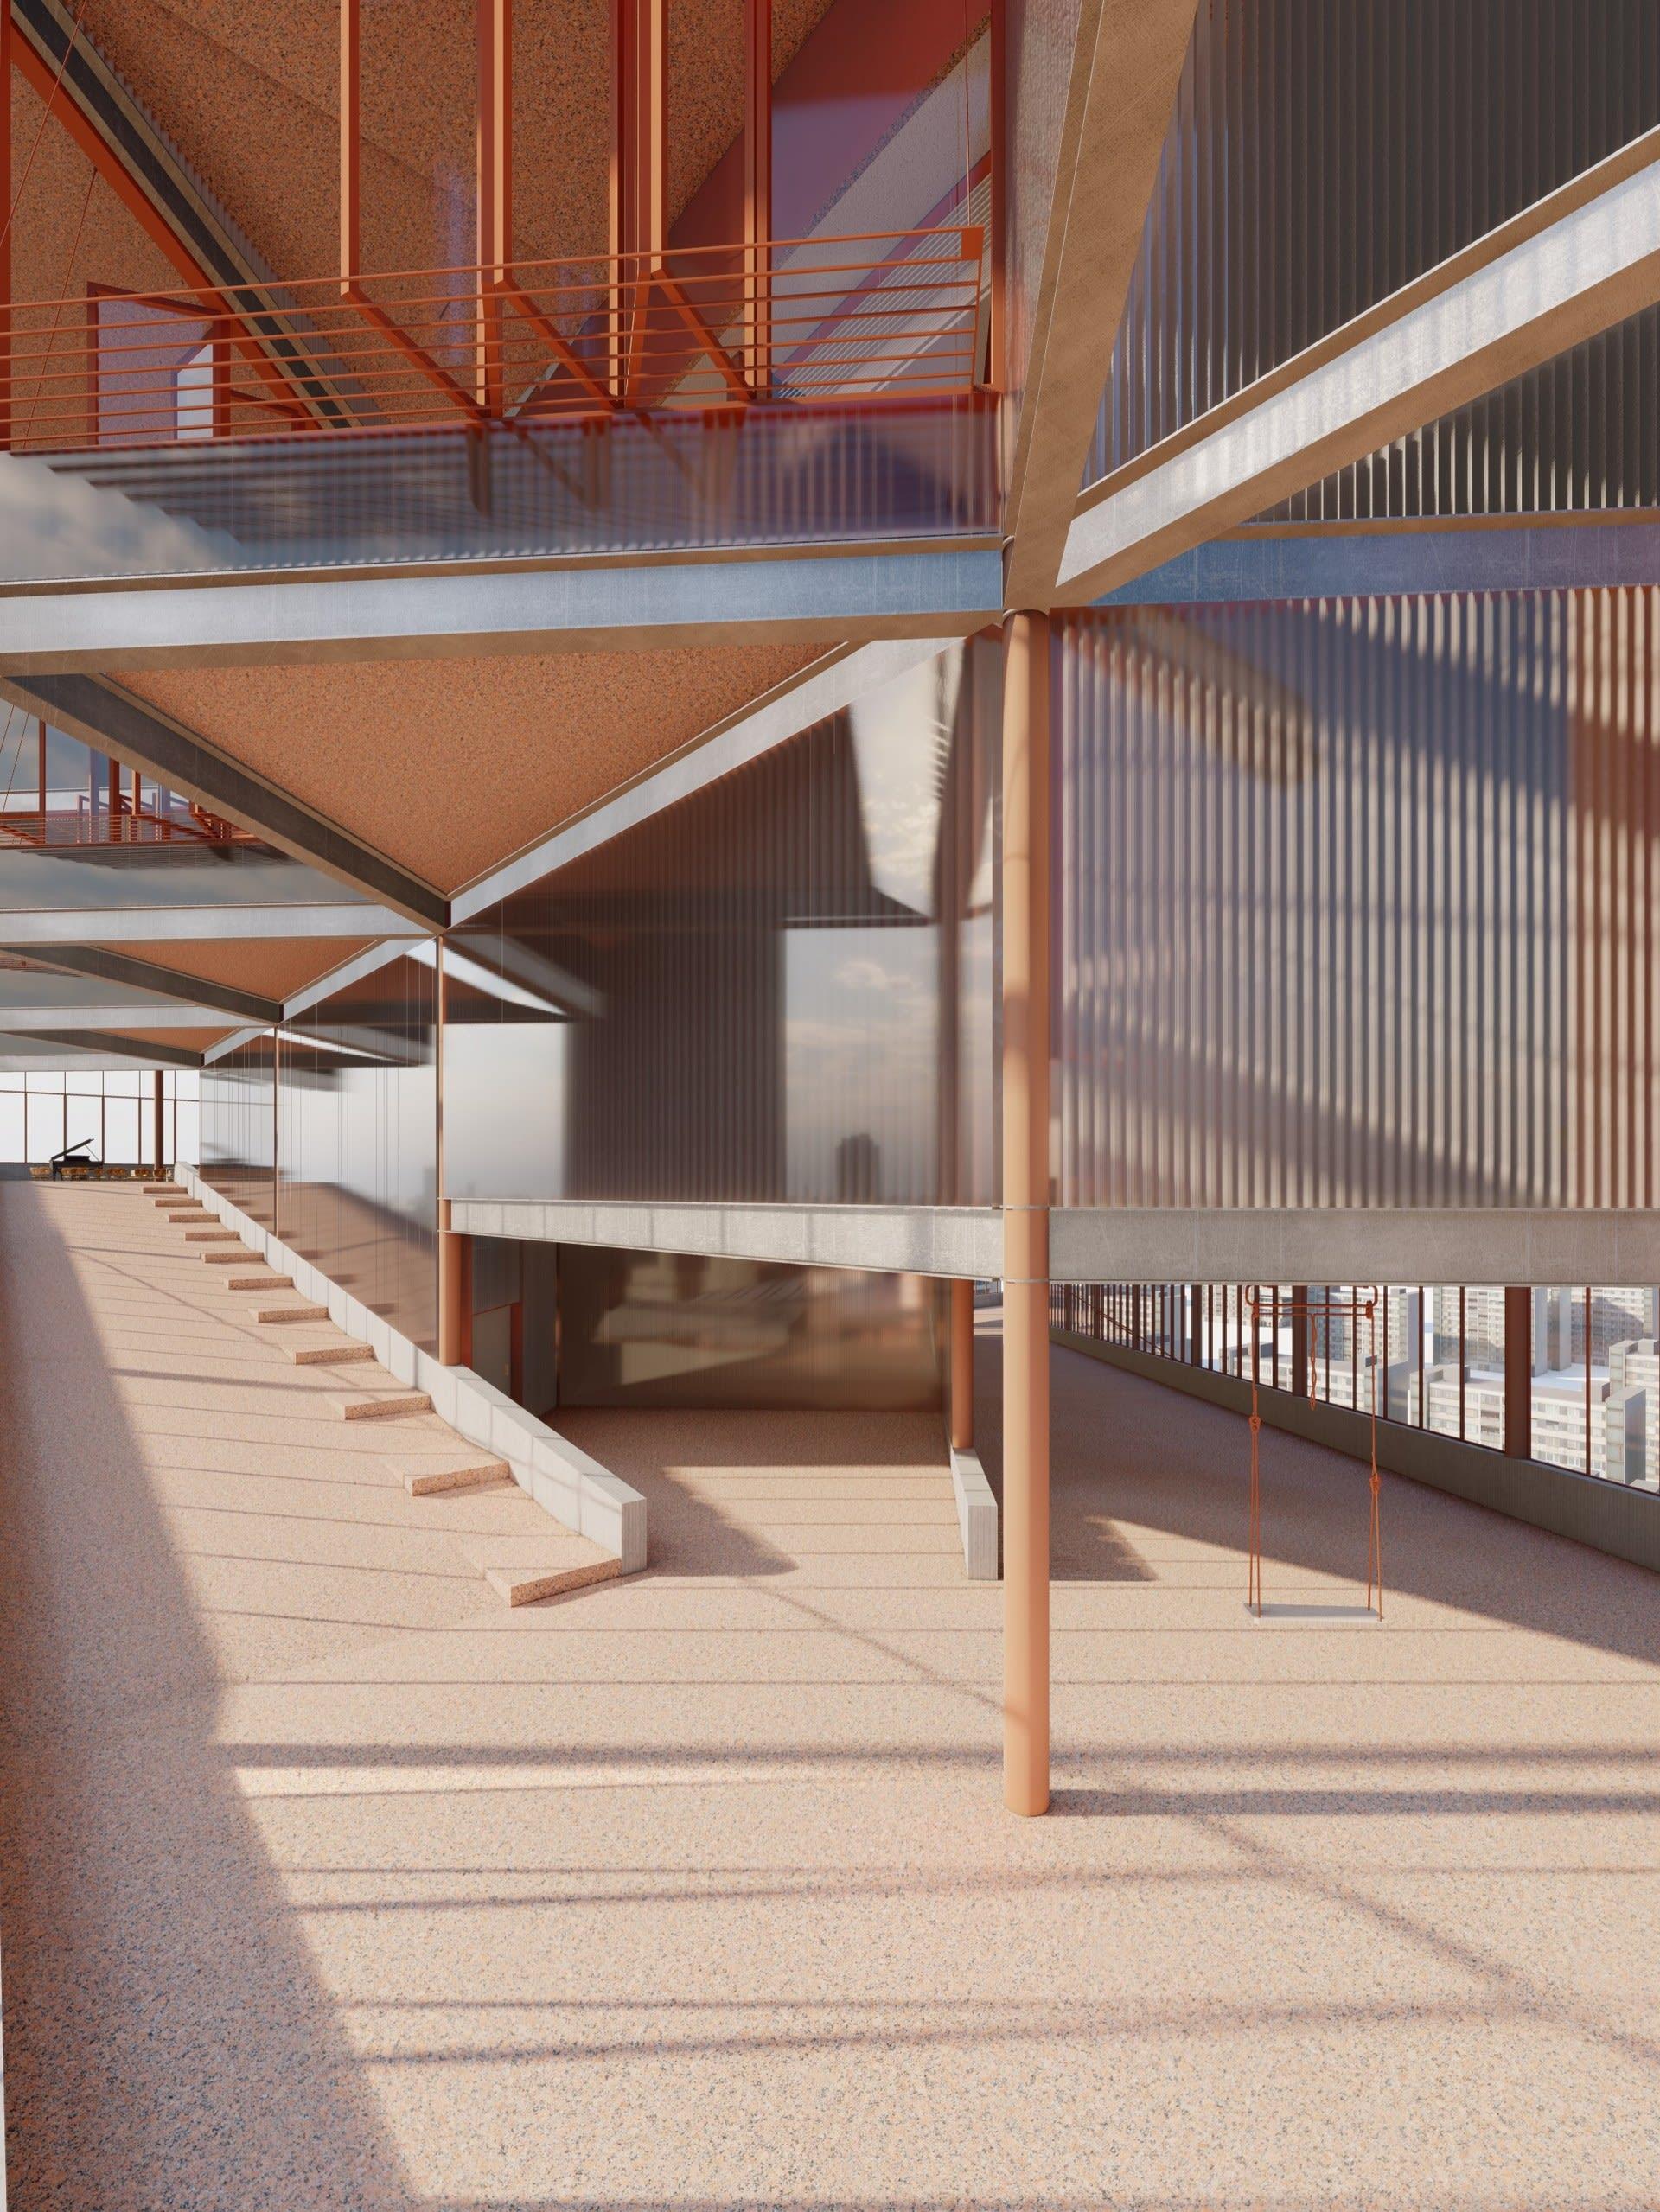 Interlocking of Vertical Spaces